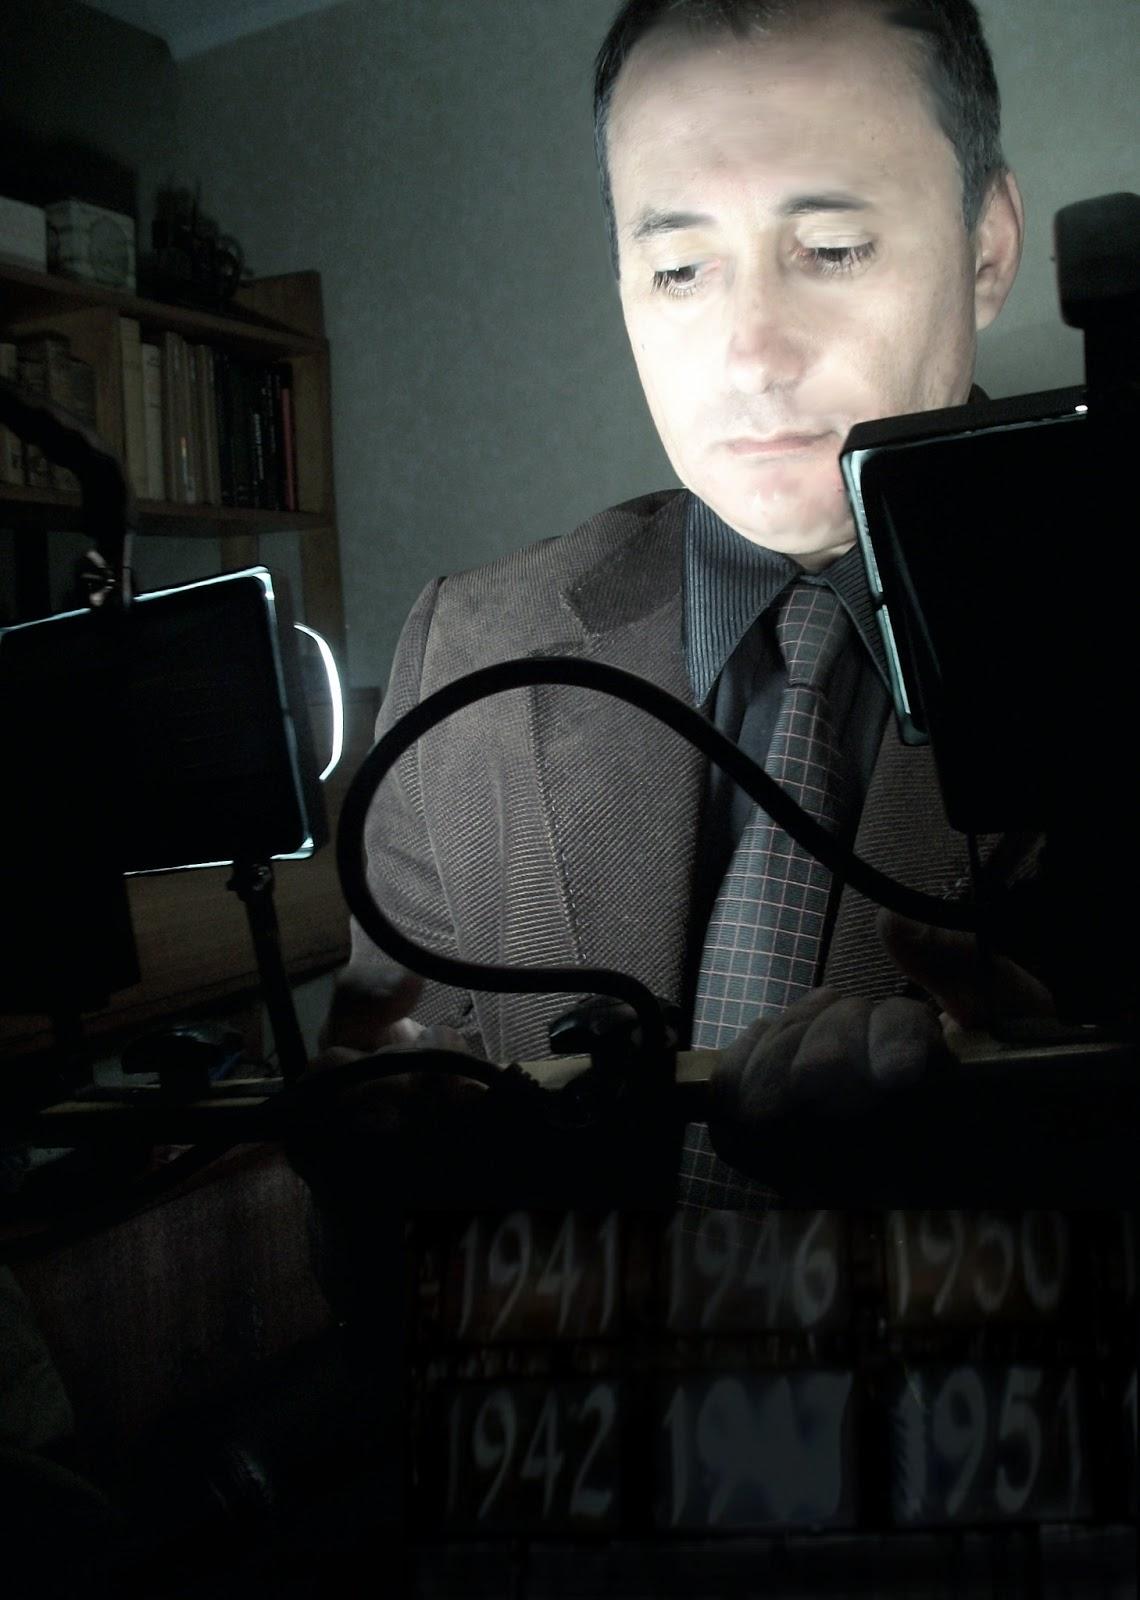 http://3.bp.blogspot.com/-dS5SqzmKfQ4/UVNLLFyO1AI/AAAAAAAAHBw/vwXlelXTINc/s1600/Adolfo+Vasquez+Rocca+_+Camara+de+Cine+Director+_Portrait+Pau++70+.JPG